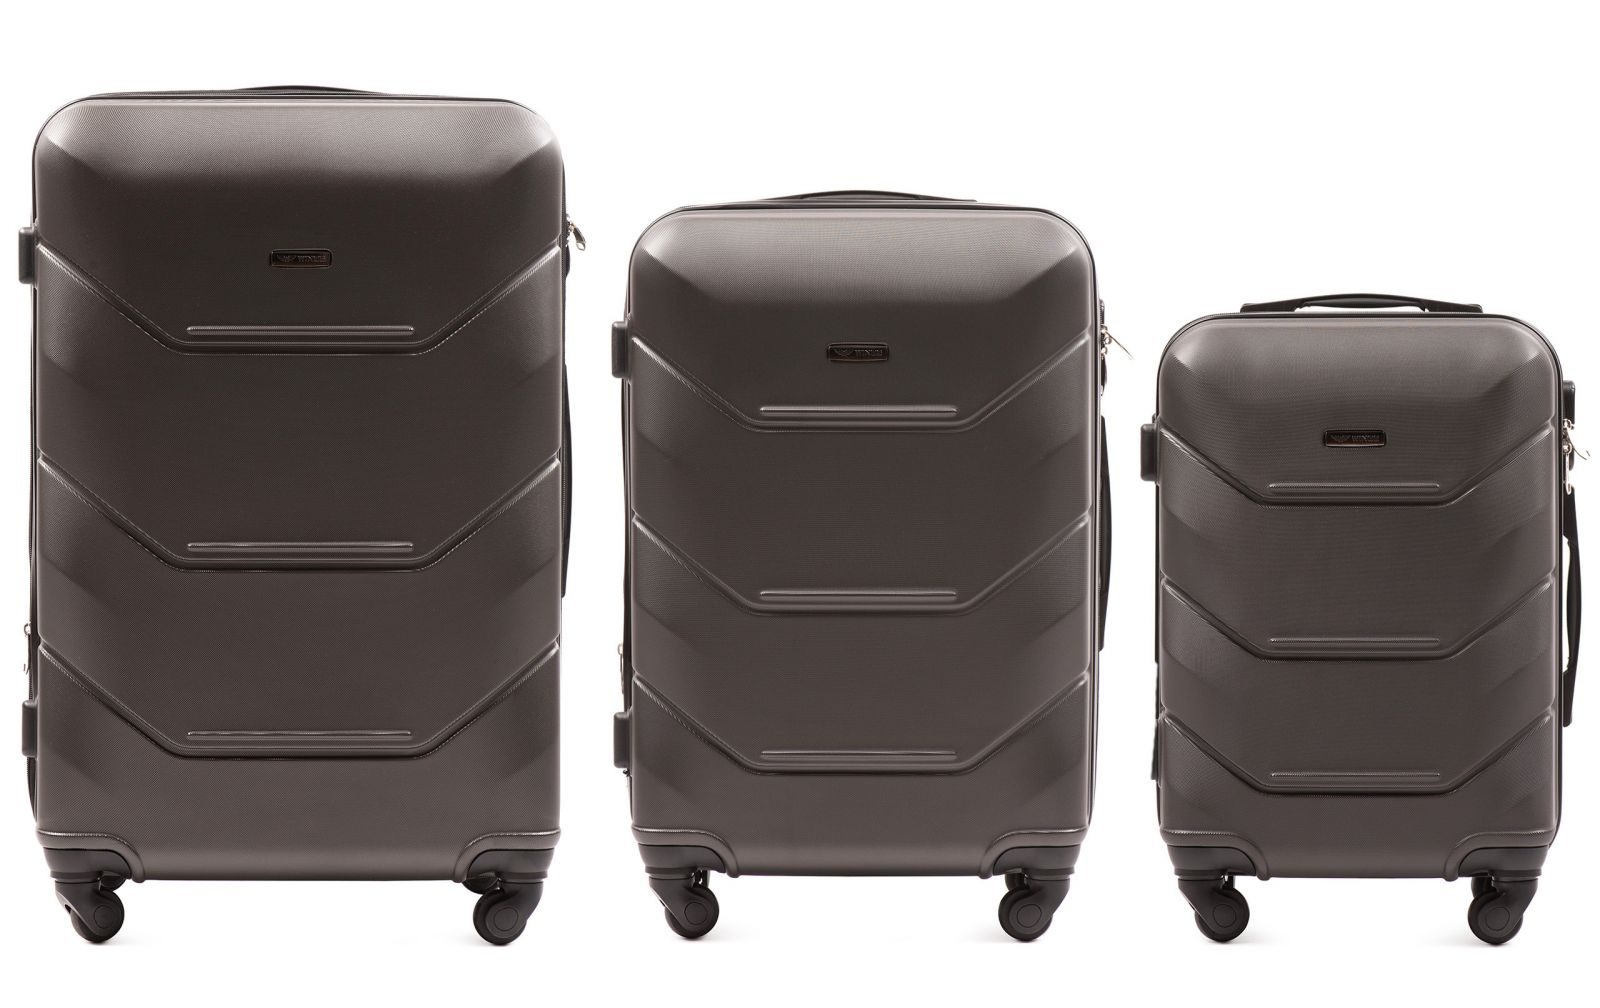 Cestovní kufry sada WINGS 147 ABS DARK GREY